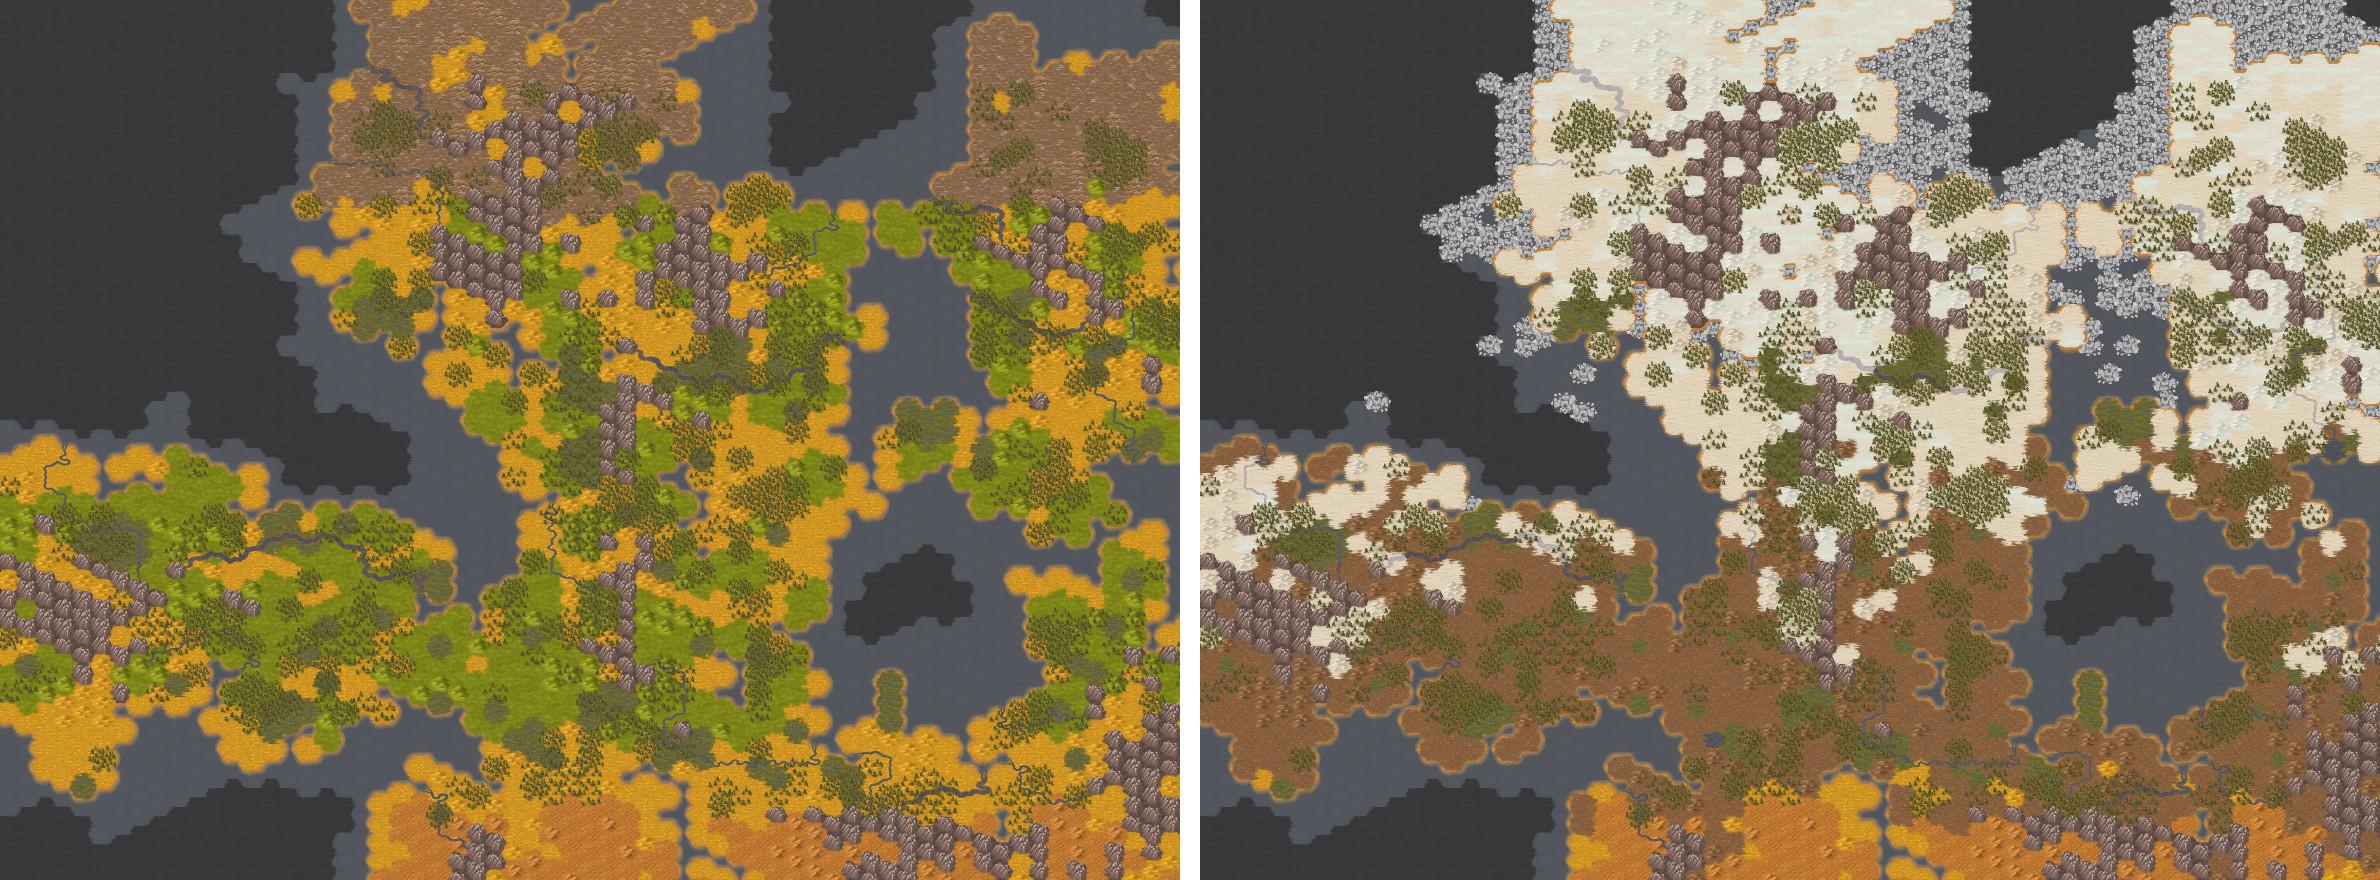 Seasons_Comparison.jpg